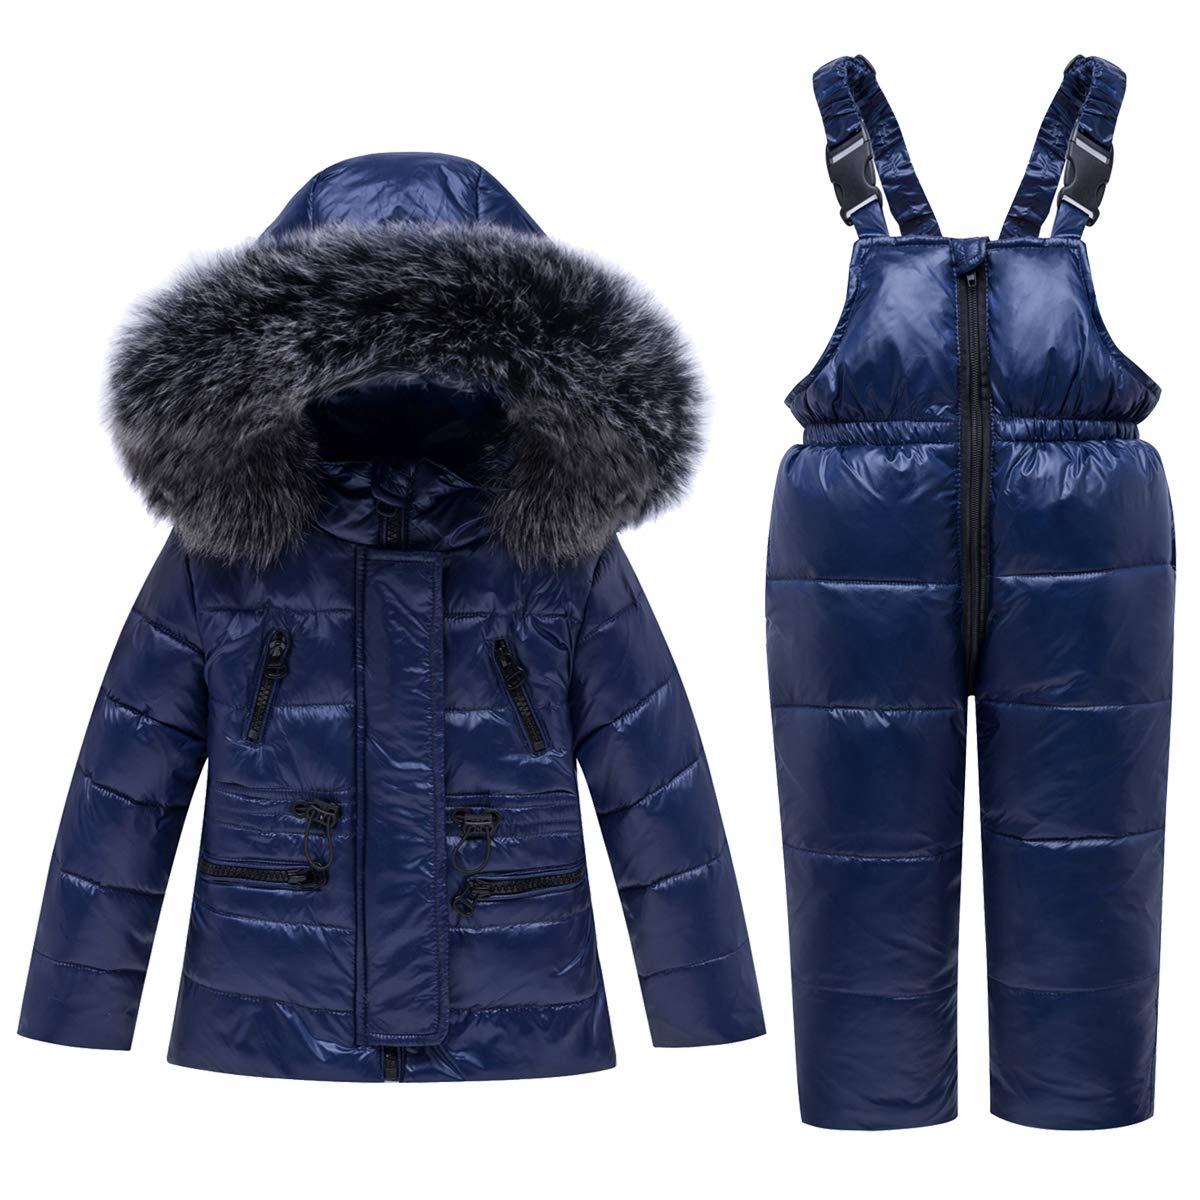 Kids Winter Puffer Jacket and Bib Snowpants - Ski Suits 2-Piece Snowsuit Ultralight Skisuit Set Hooded Coats and Bib Pants, Blue 18-24 Months by JiAmy